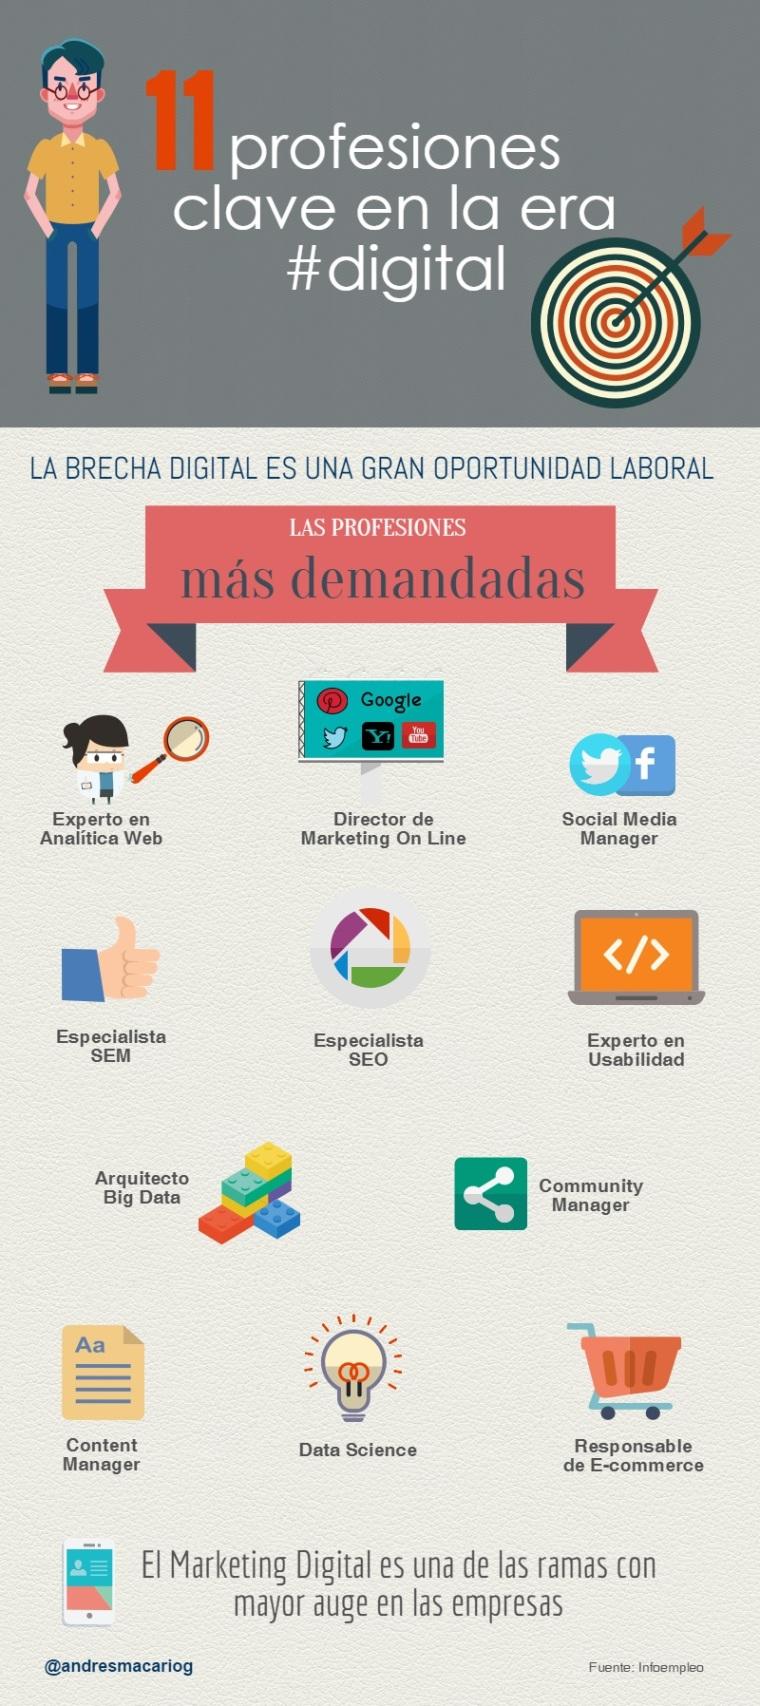 11-profesiones-clave-era-digital-infografia-andres-macario